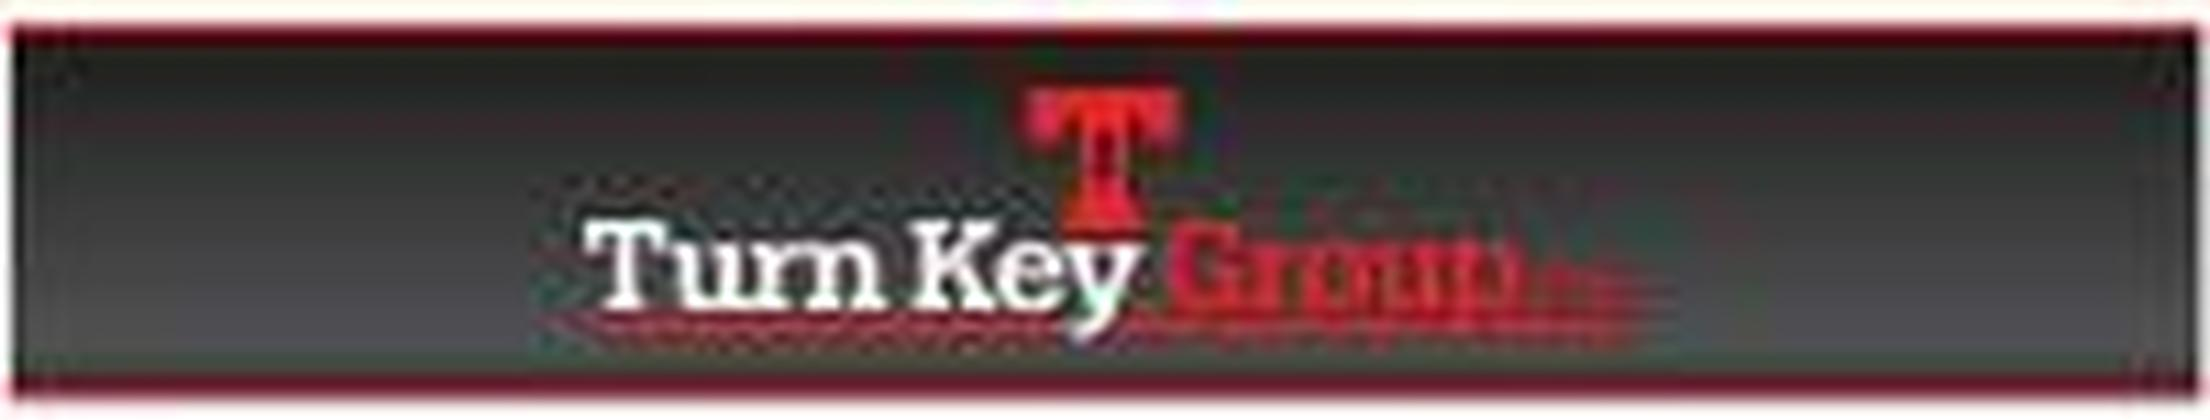 Turn Key Group